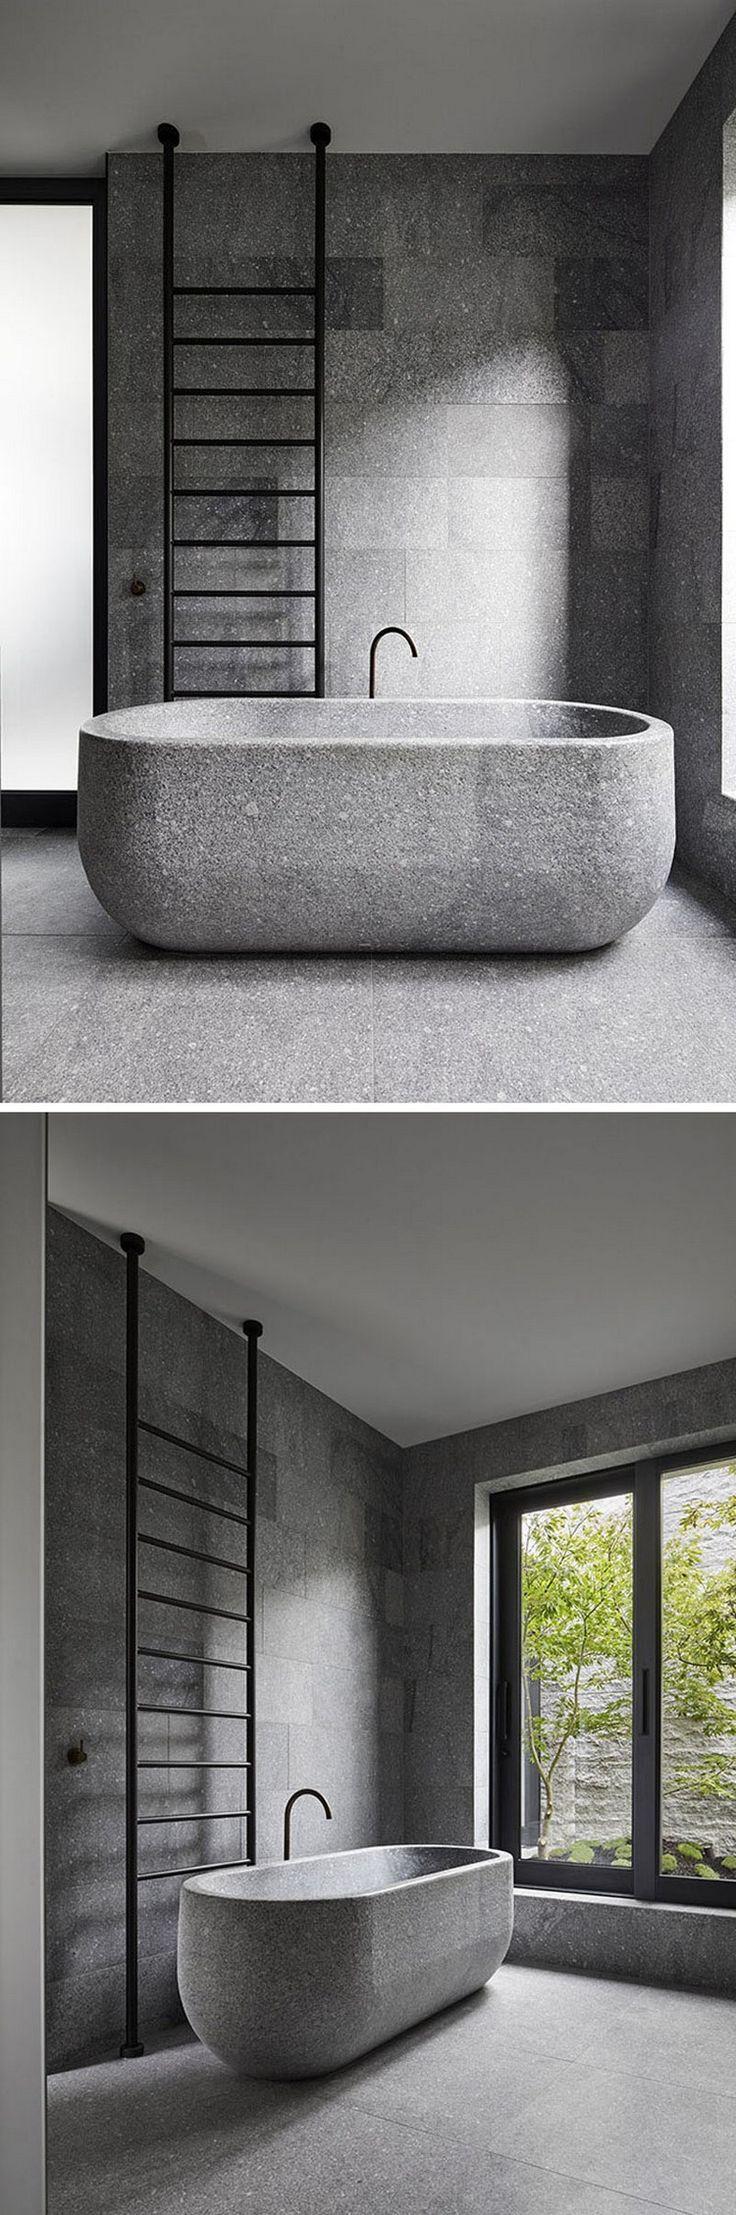 6 x 9 badezimmer design  best Санузел images on pinterest  bathroom bathroom ideas and